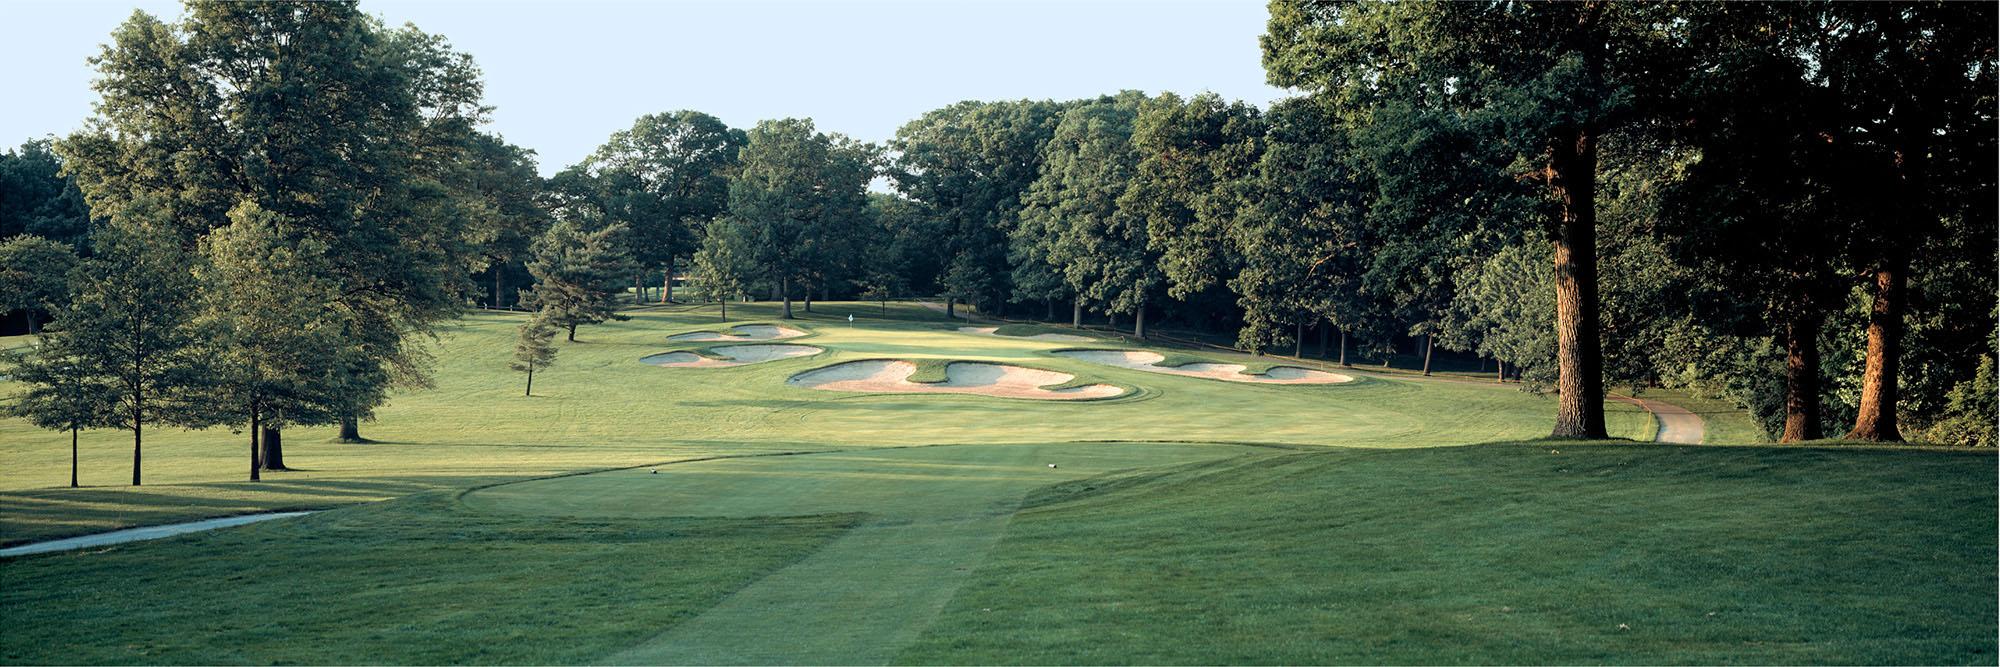 Golf Course Image - Cog Hill 4 No. 6